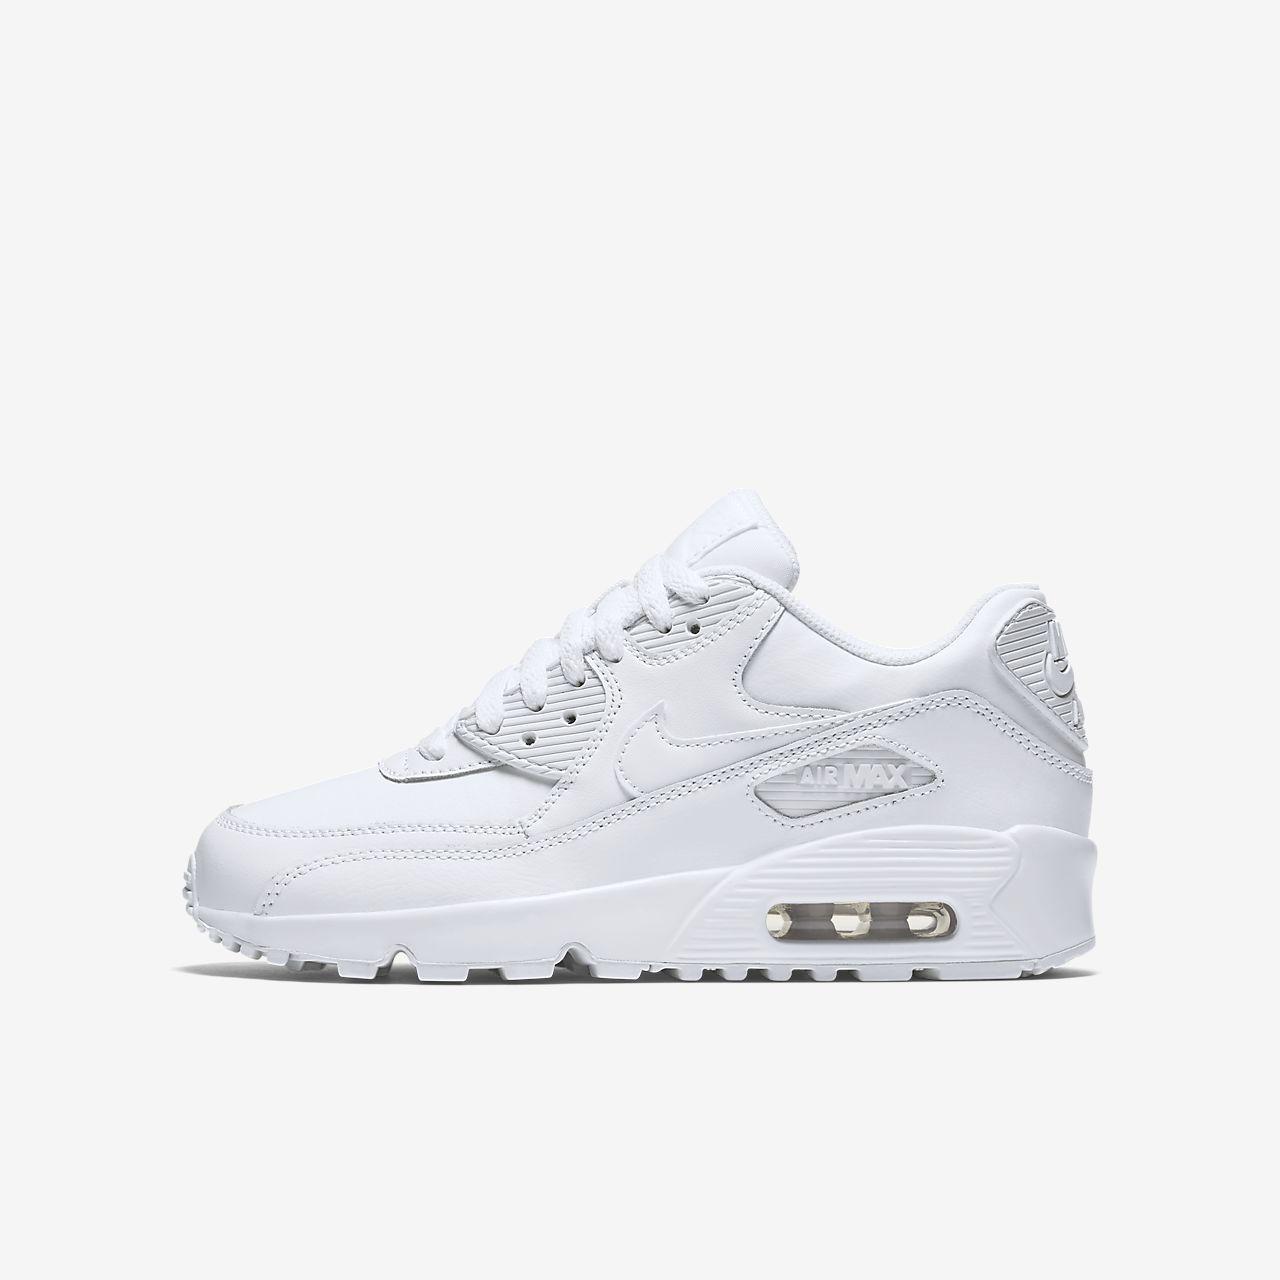 nike air max 90 leather - zapatillas de running hombre